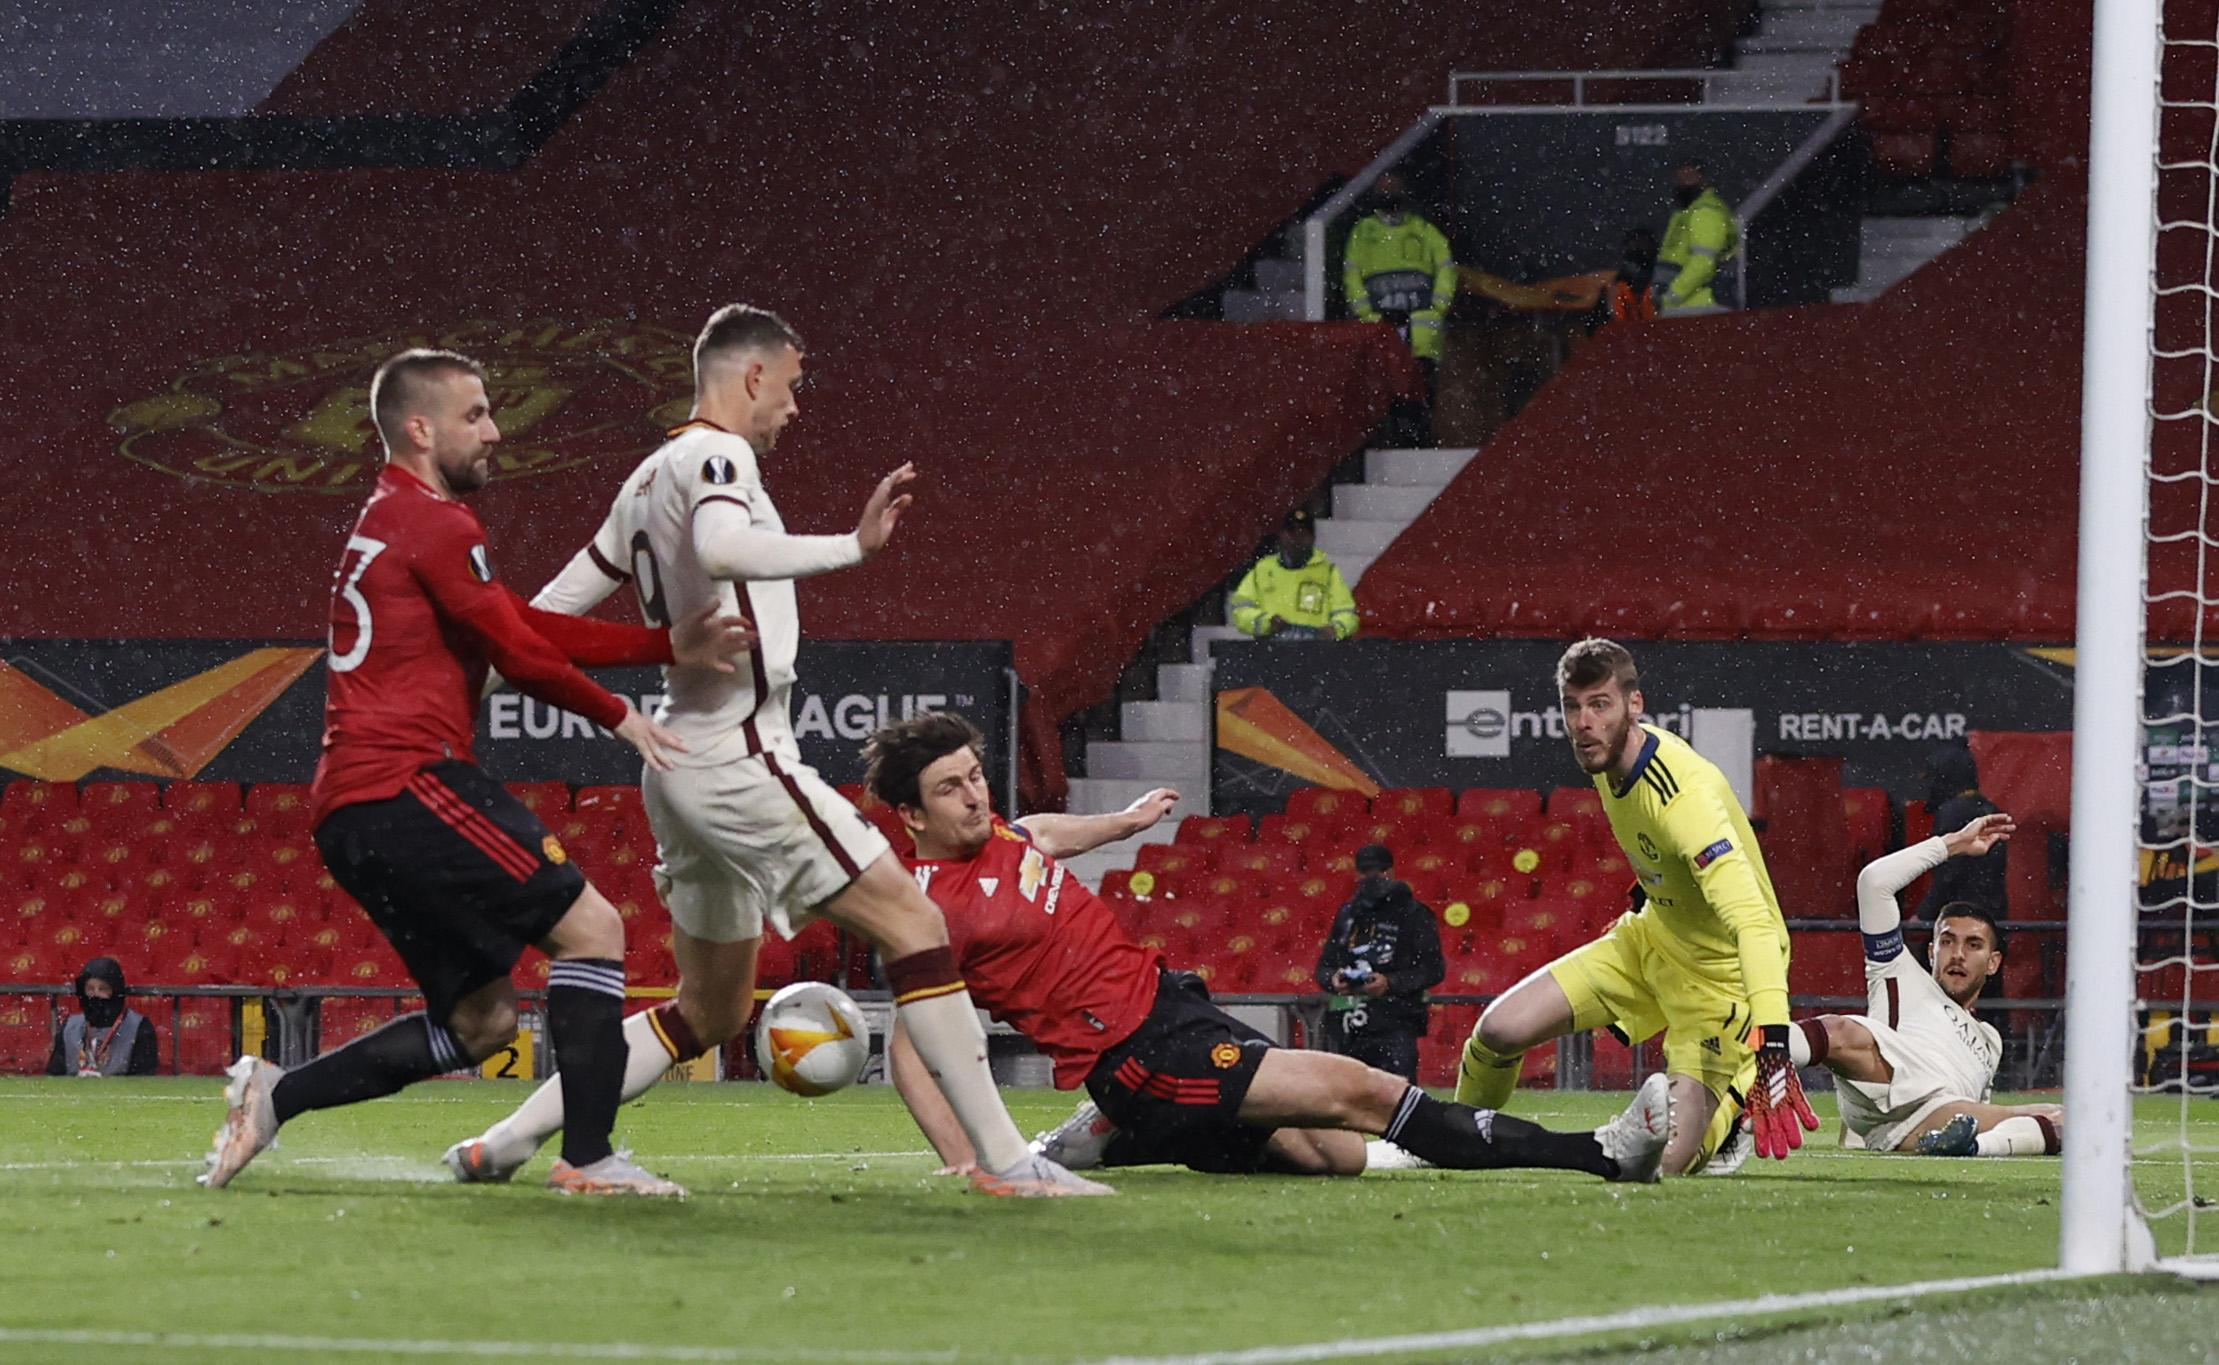 Europa League - Semi Final First Leg - Manchester United v AS Roma